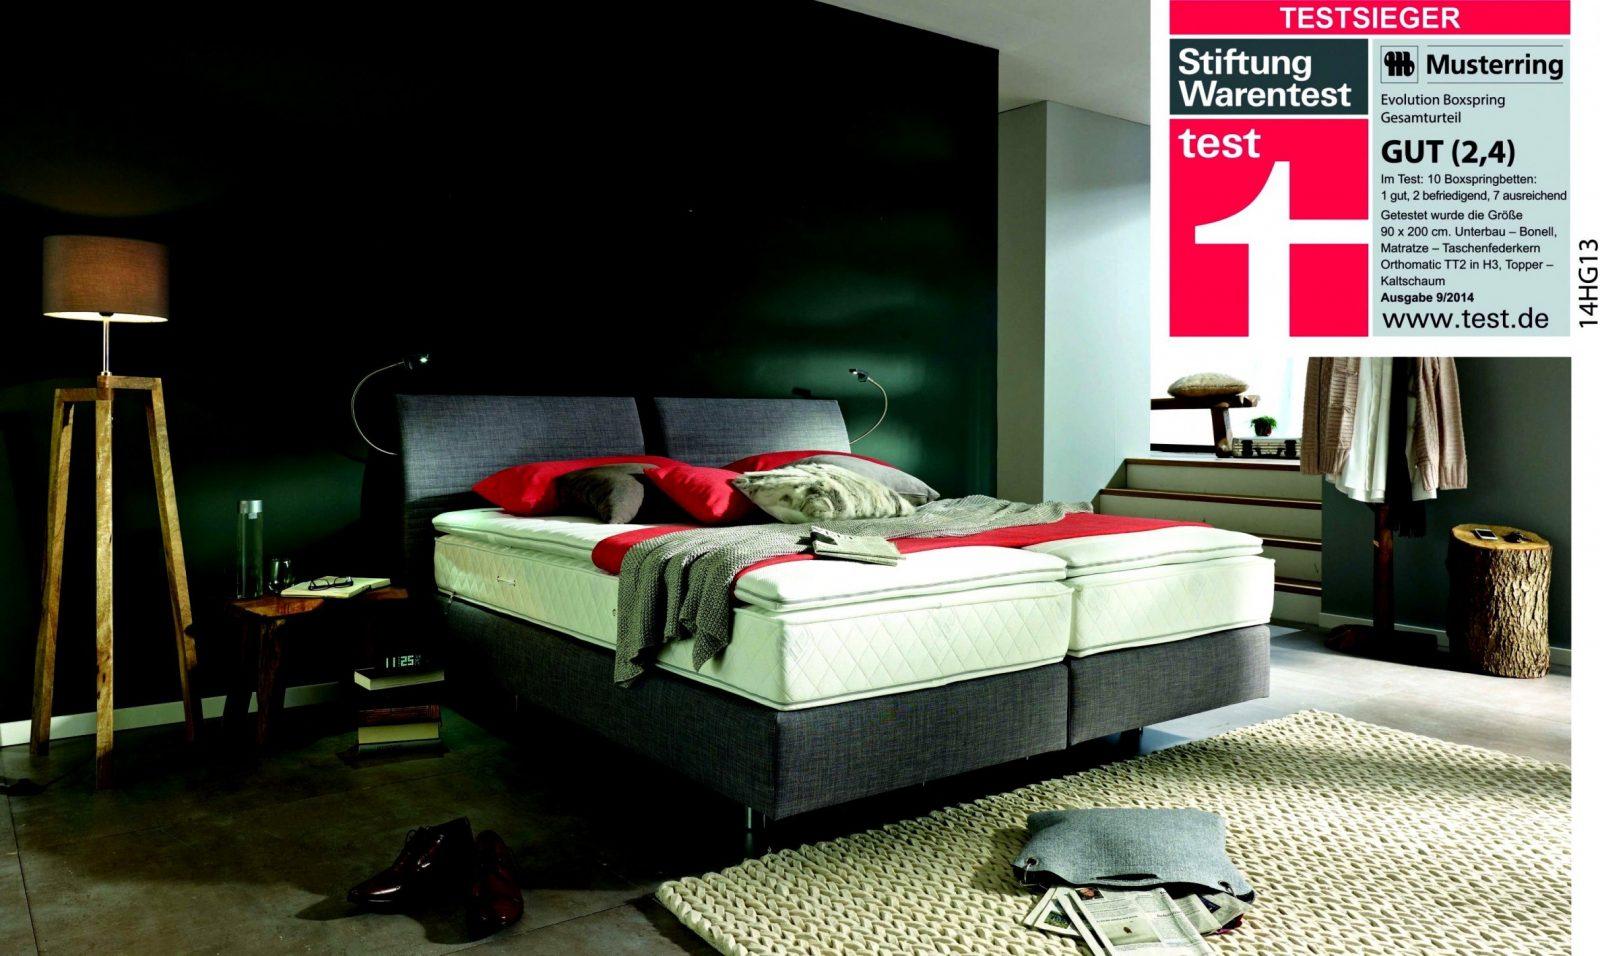 Ruf Betten Bewertung  Bett Kollektion von Ruf Boxspringbett Verena Test Photo